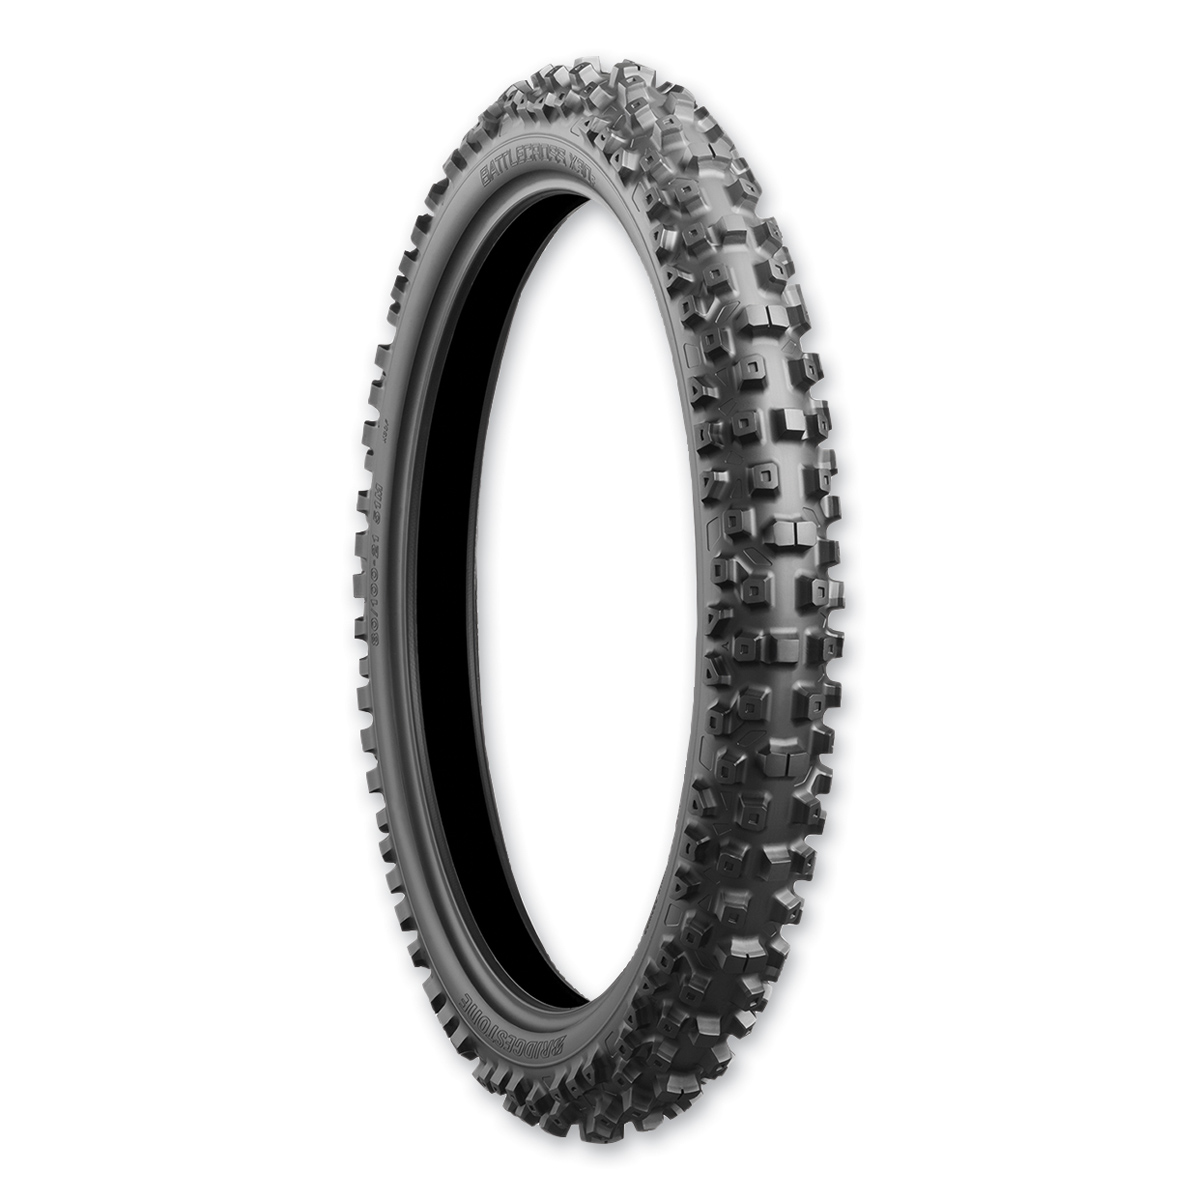 Bridgestone Battlecross X30 90/100-21 I/T Front Tire